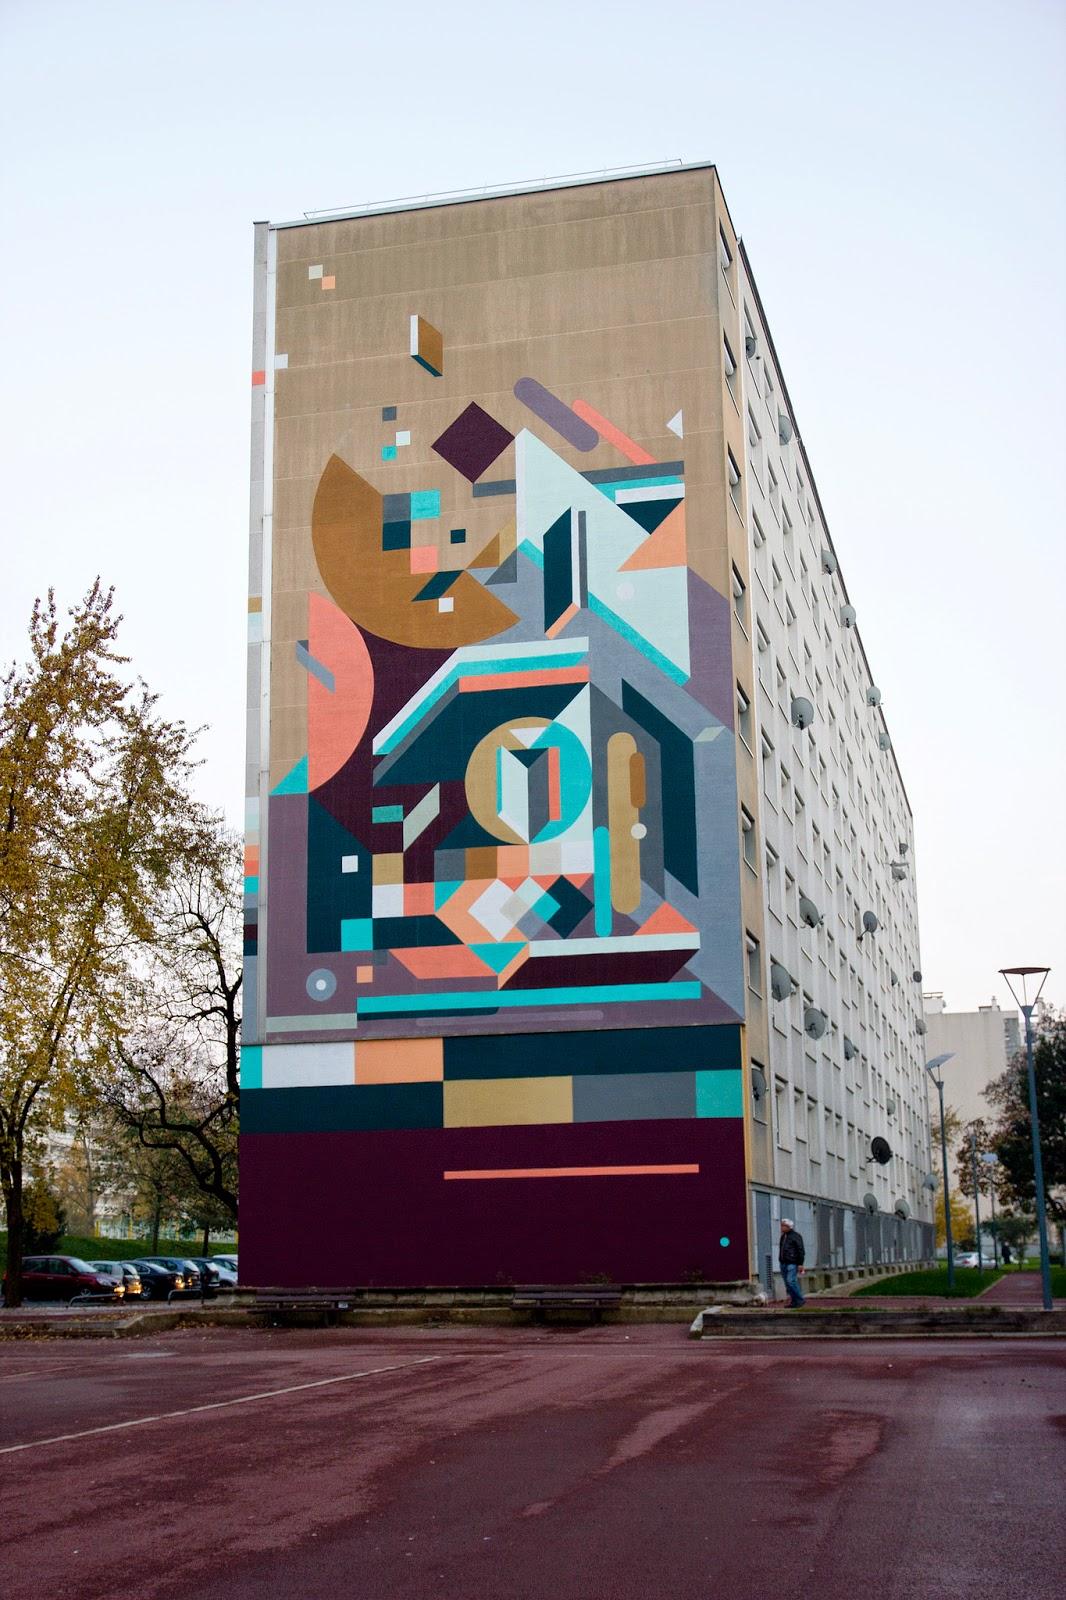 nelio paints a large abstract piece in venissieux france streetartnews streetartnews. Black Bedroom Furniture Sets. Home Design Ideas